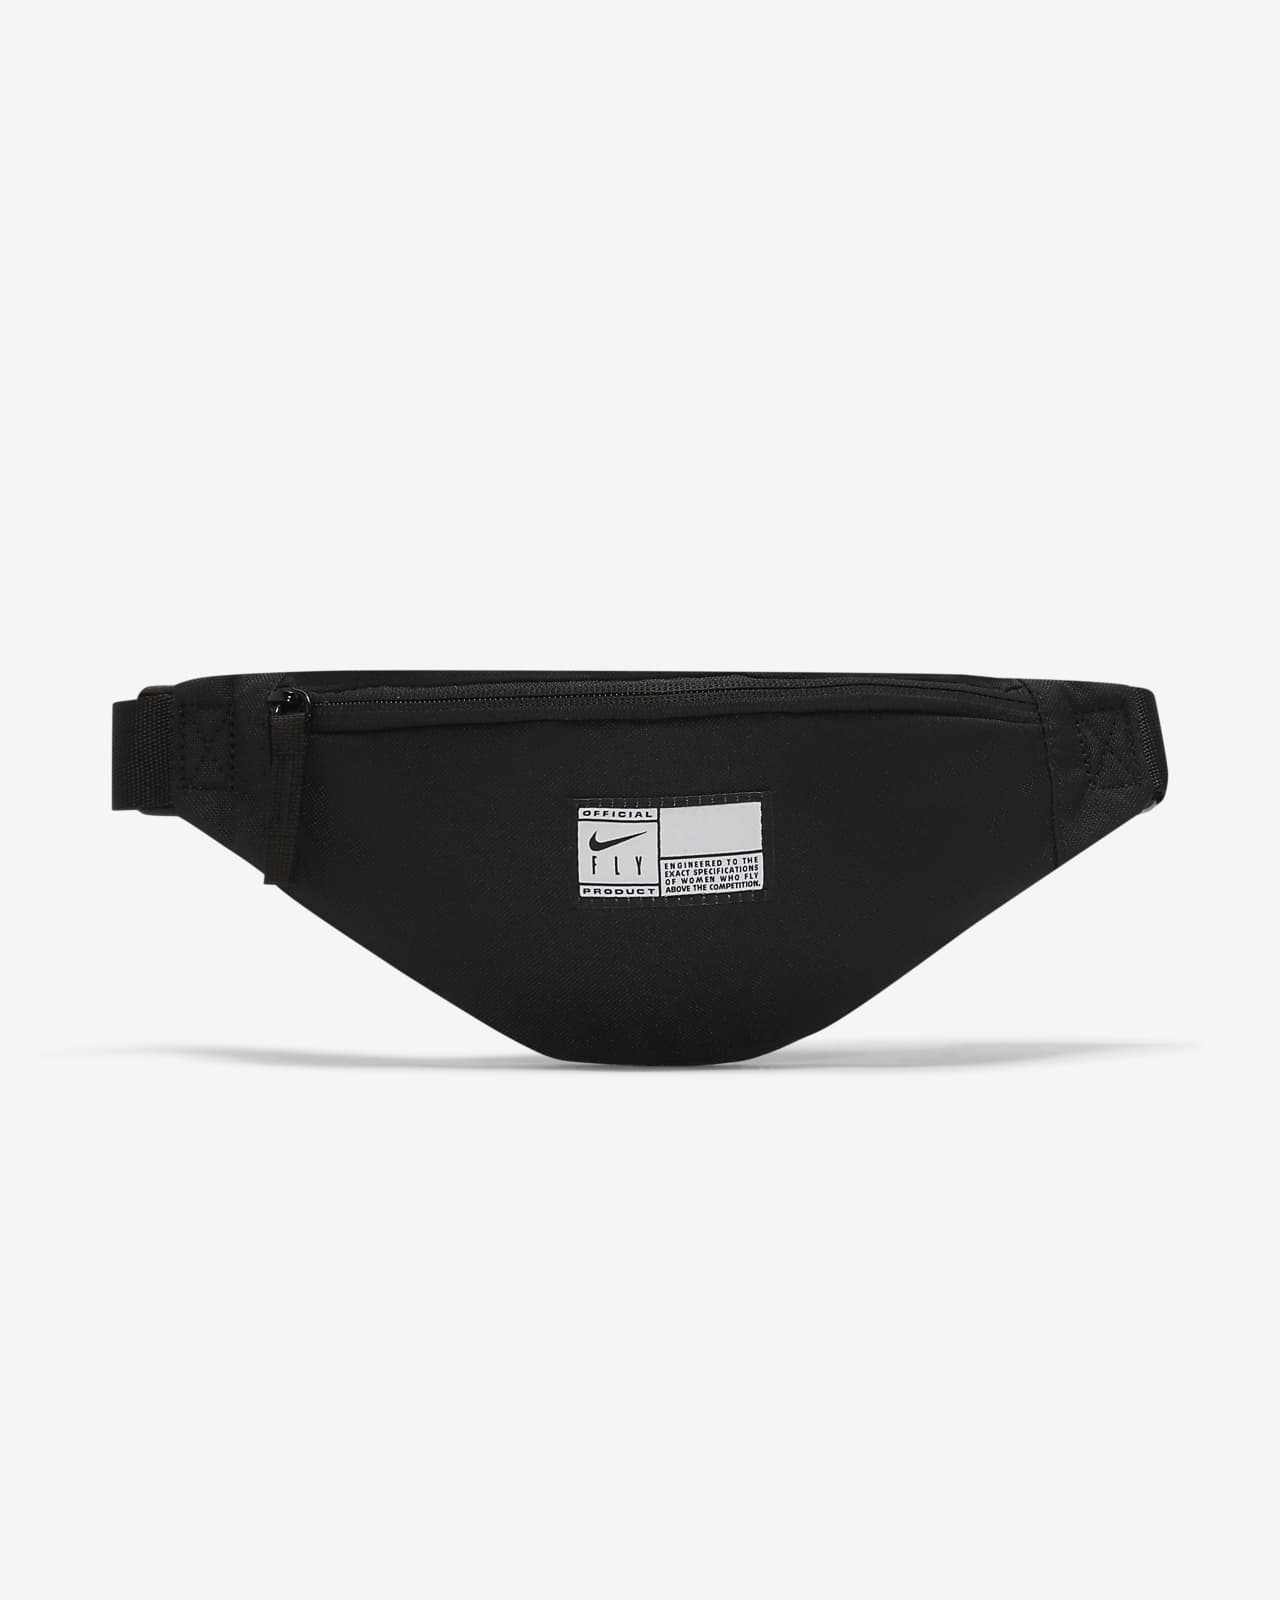 Nike Heritage Swoosh Fly 篮球腰包